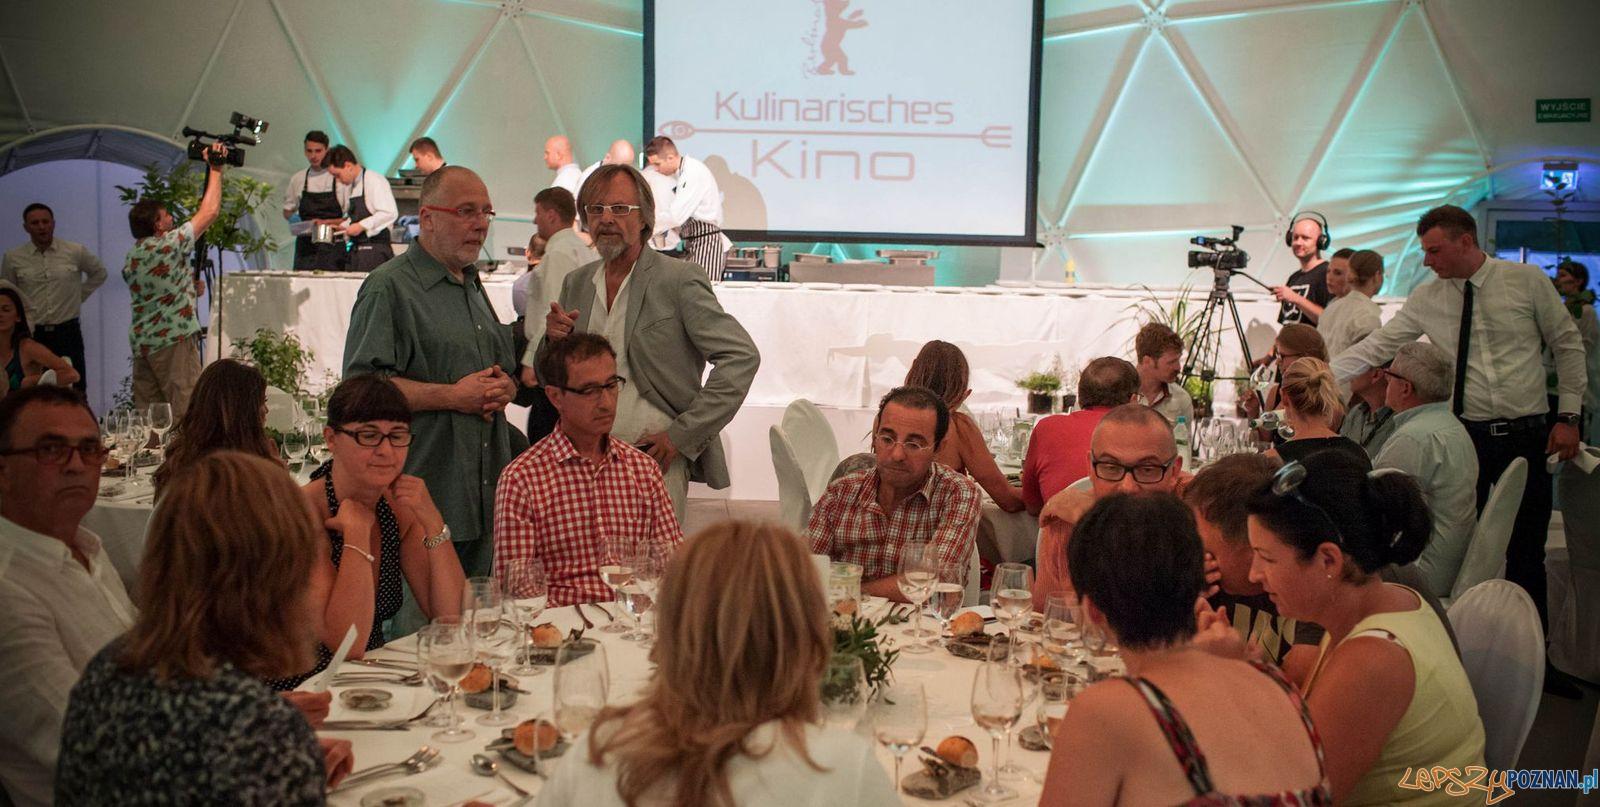 Kino kulinarne - kolacja  Foto: materiały prasowe